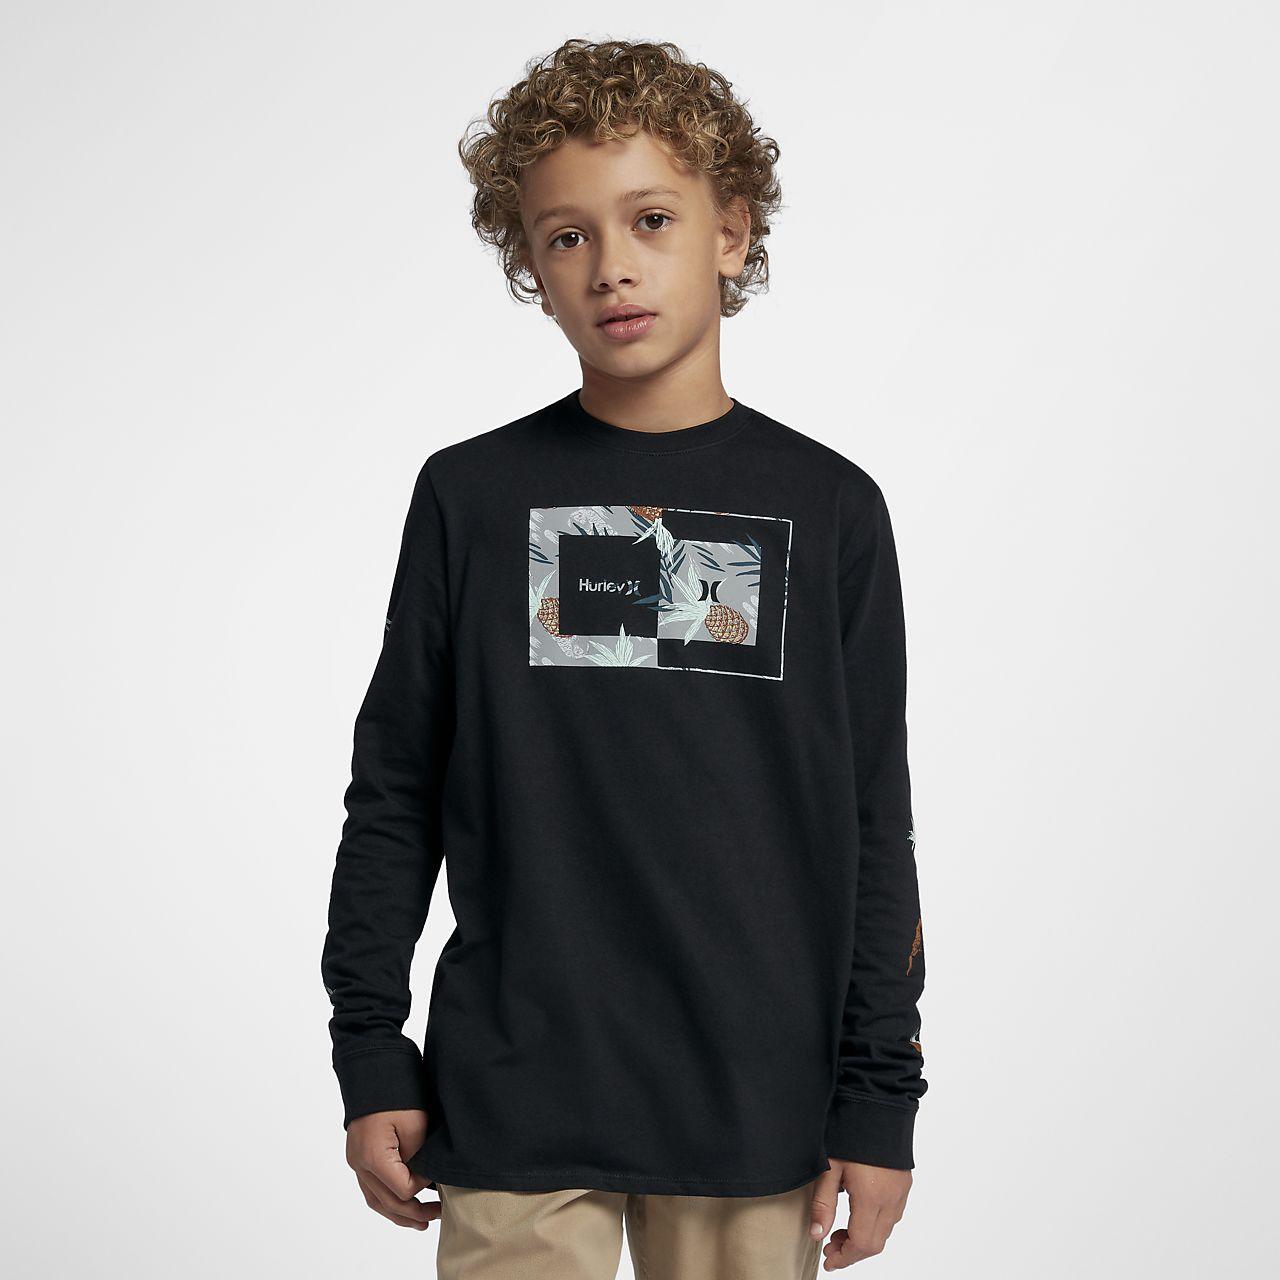 Hurley Sweet Days Big Kids' (Boys') Long Sleeve Shirt